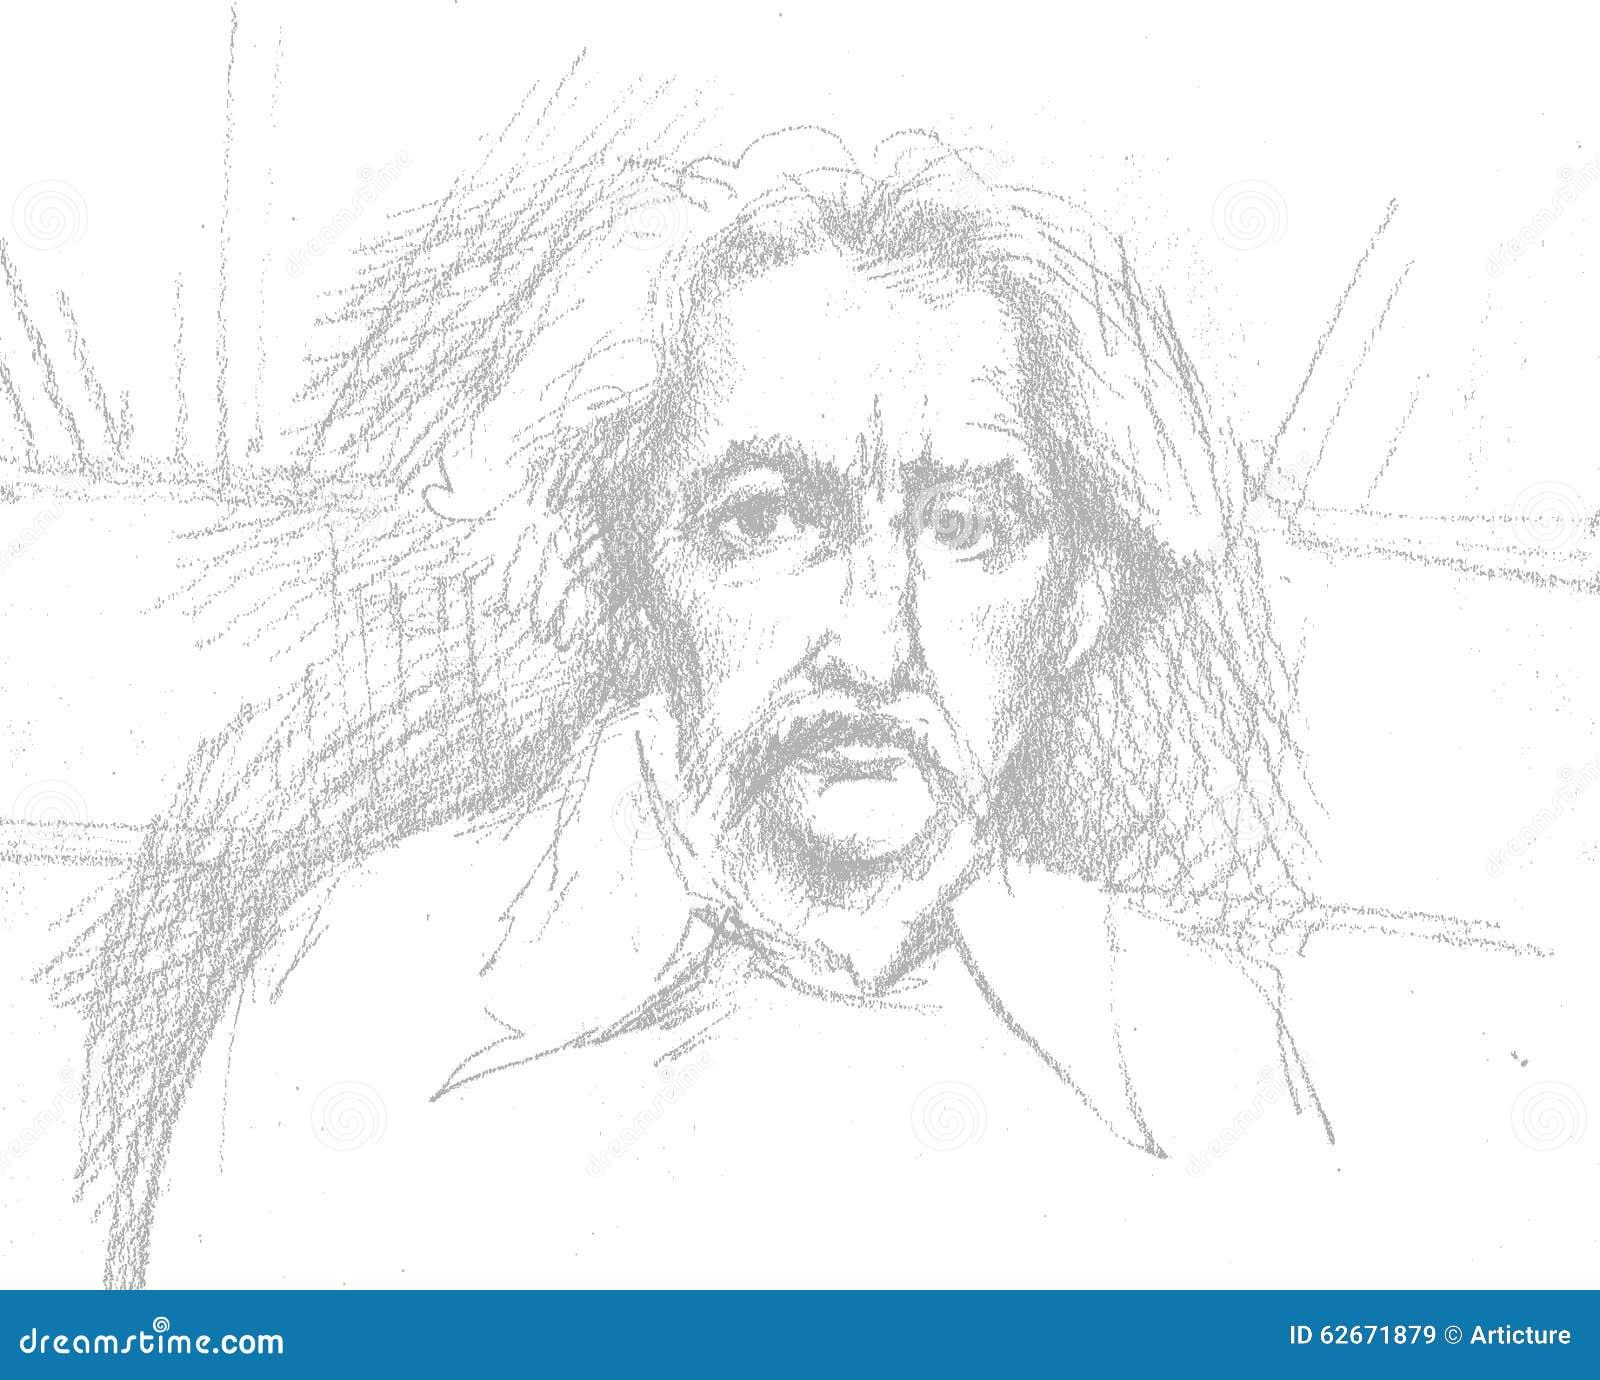 sketch of old man face stock illustration illustration of